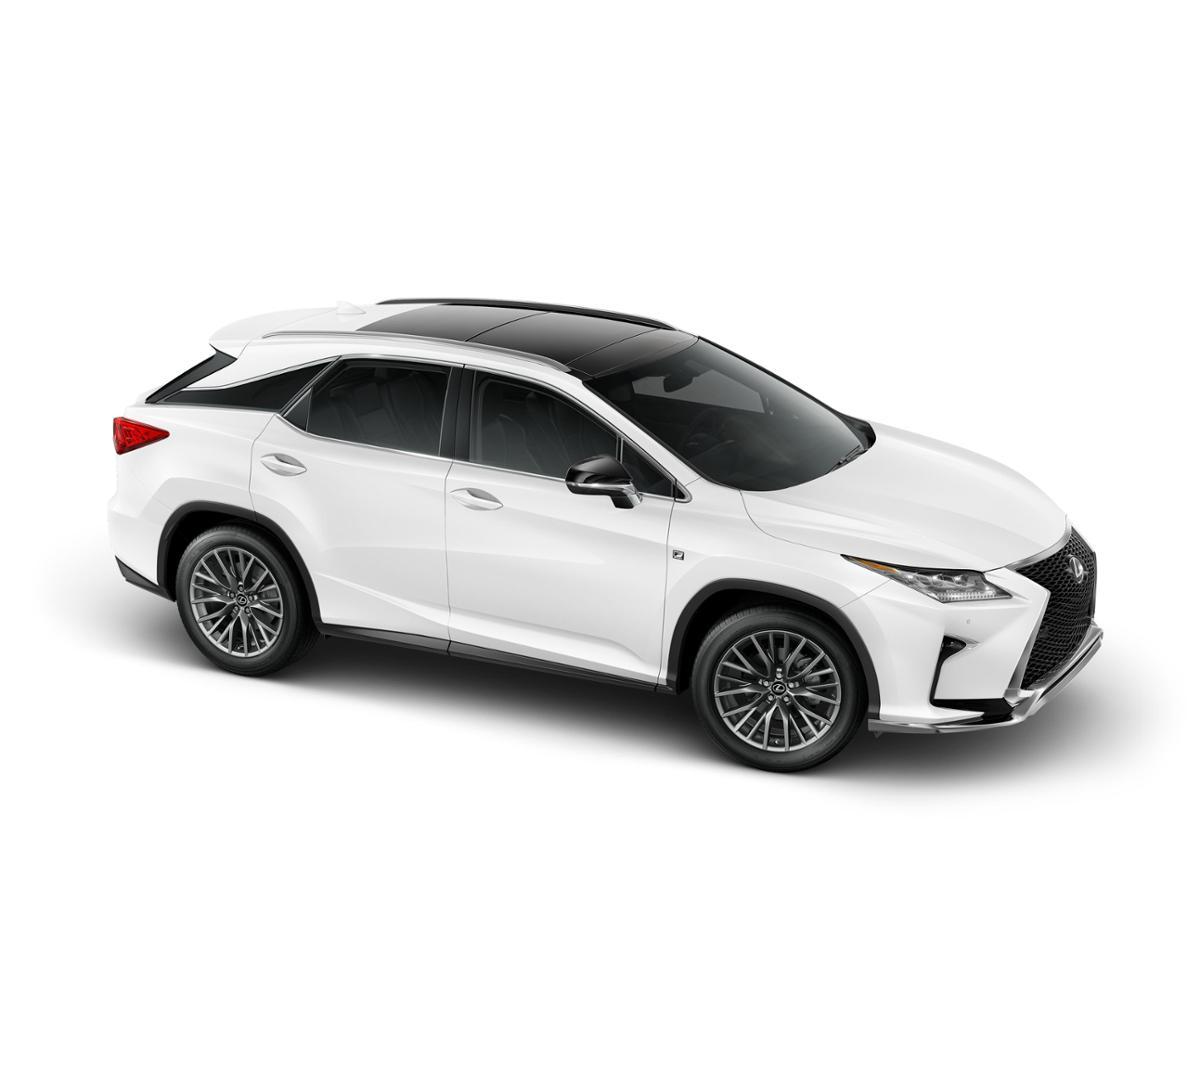 Doylestown Ultra White 2018 Lexus Rx 350 New Suv For Sale